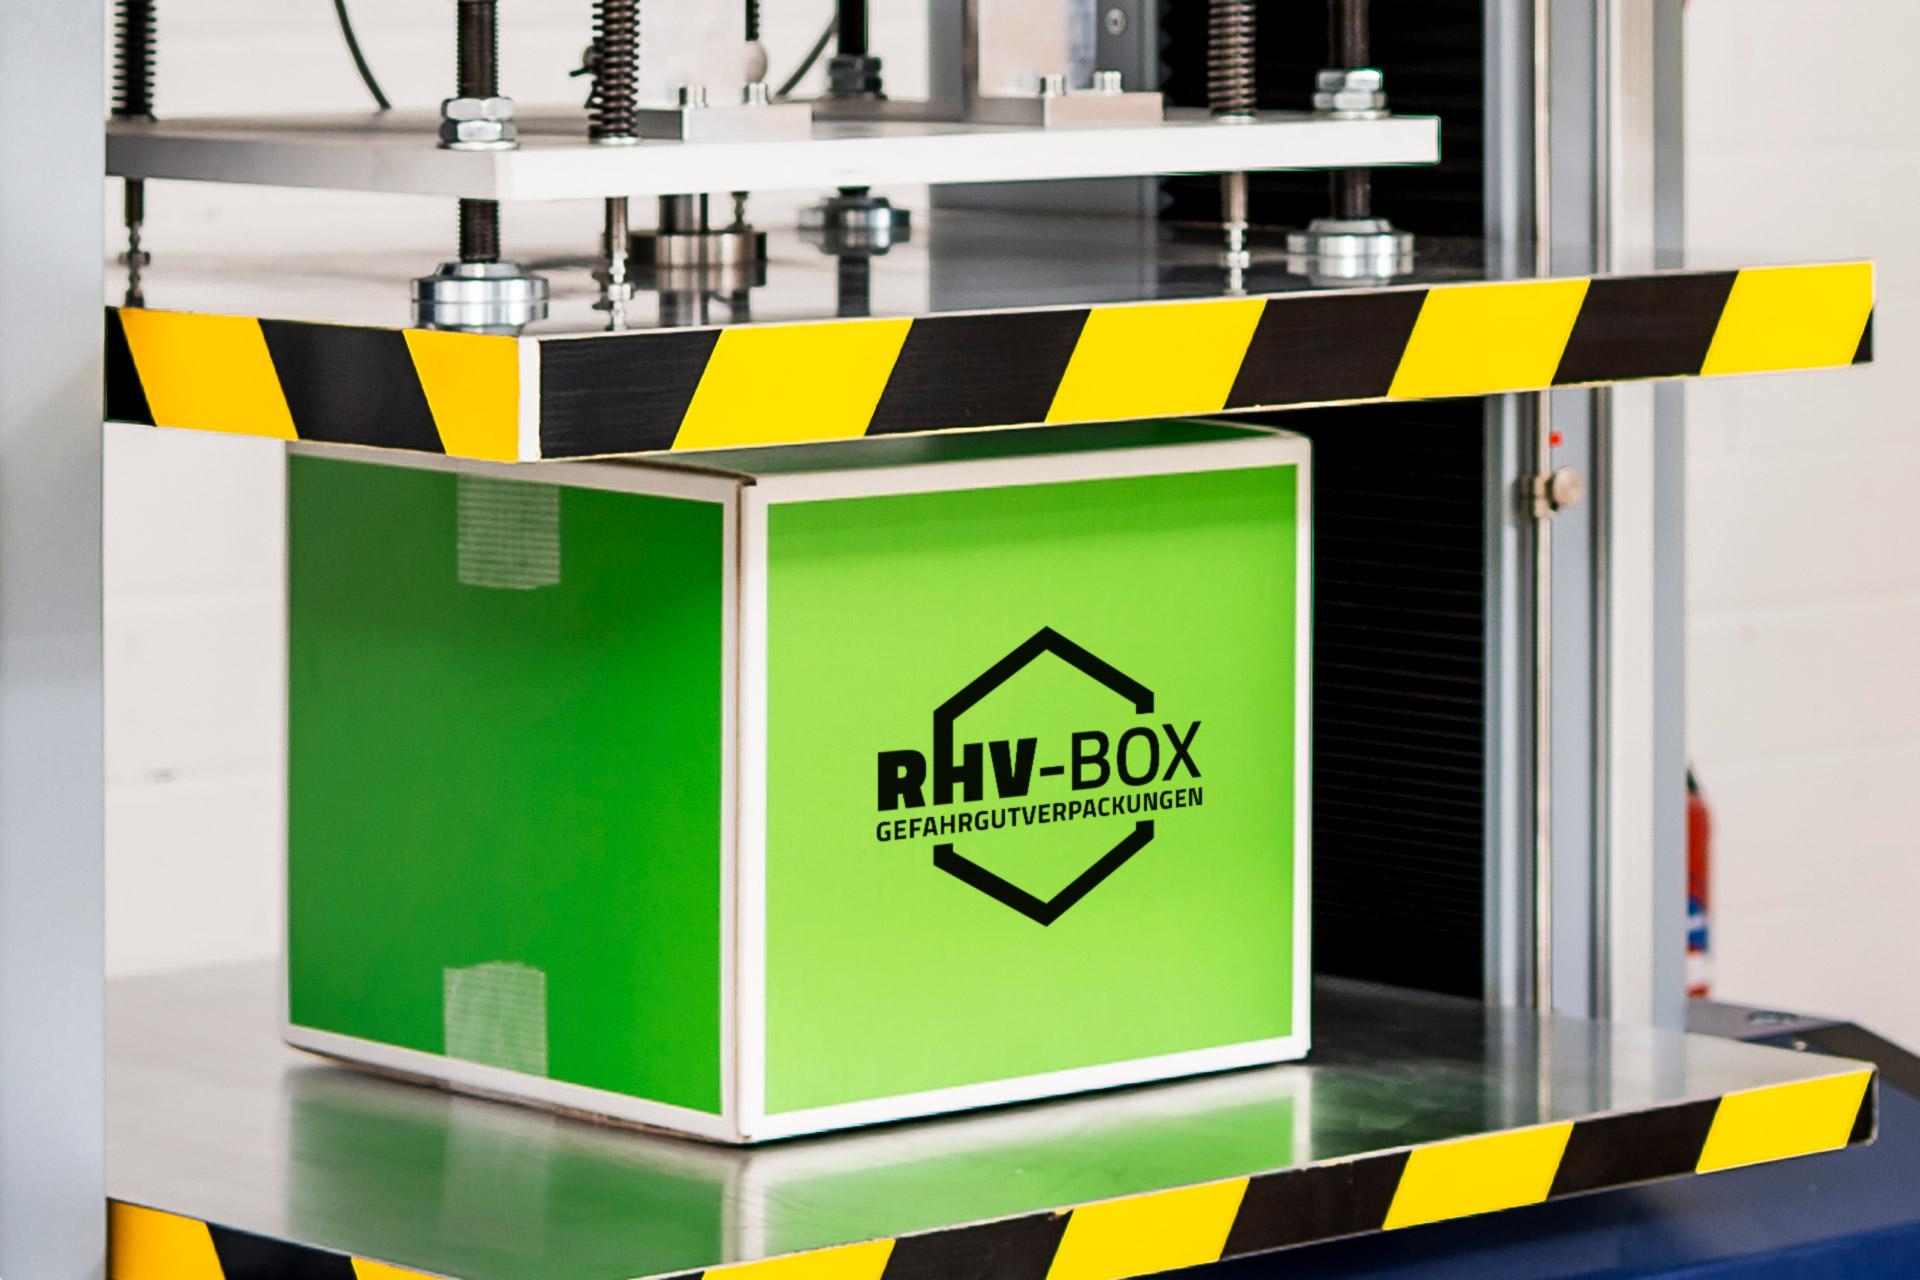 richter & heß Fotoshootings mit RHV-Box-Logo-Visualisierung